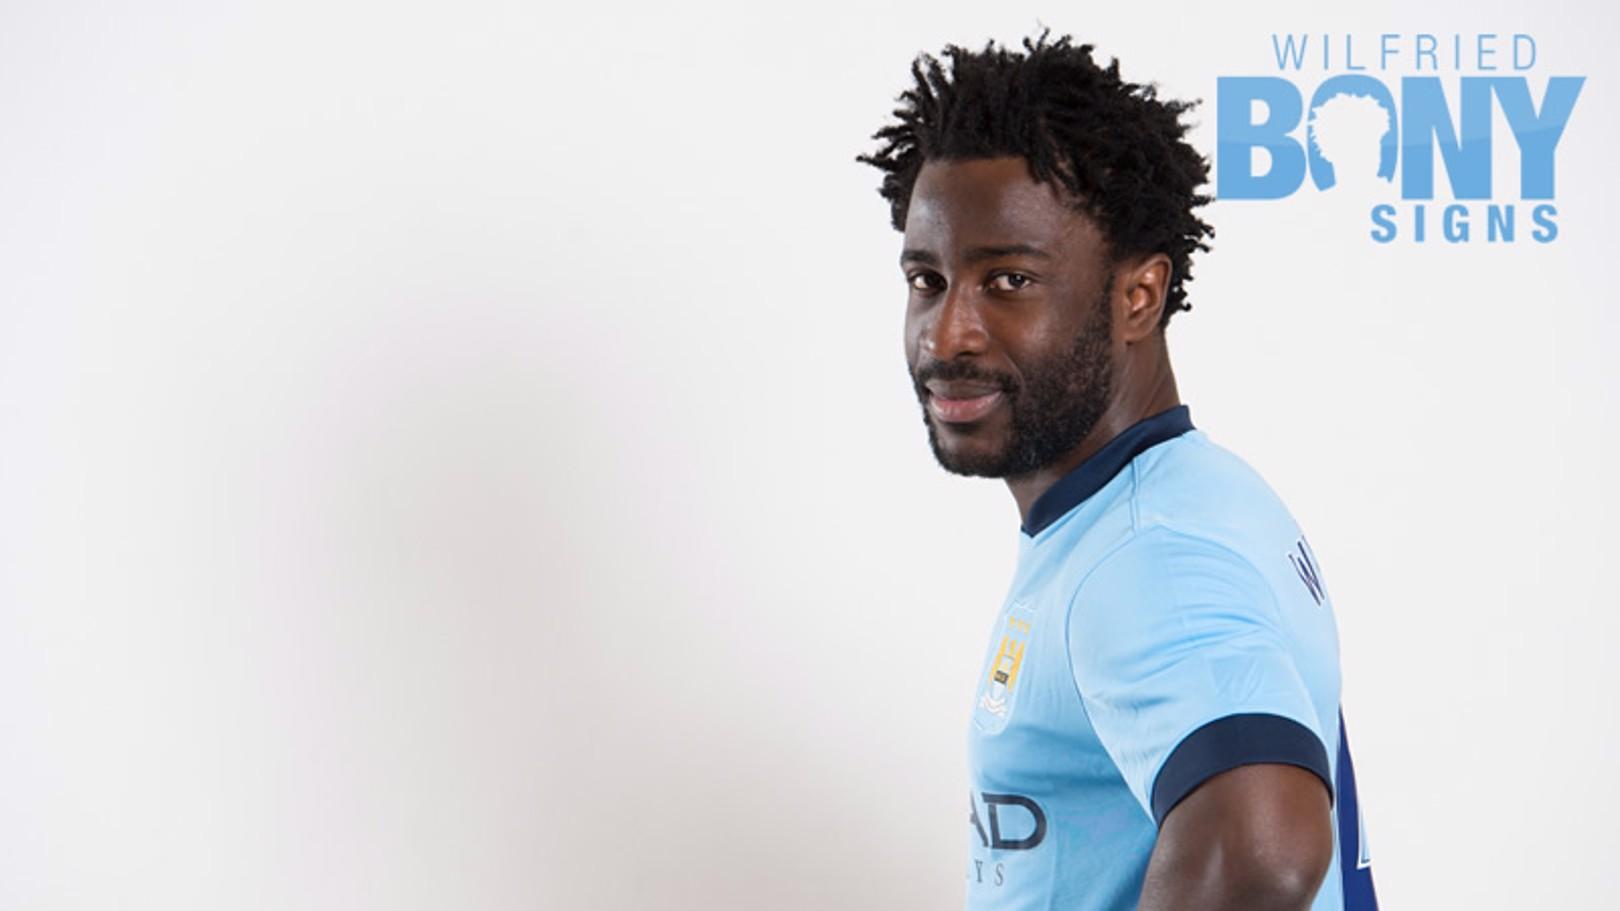 Wilfried Bony joins City